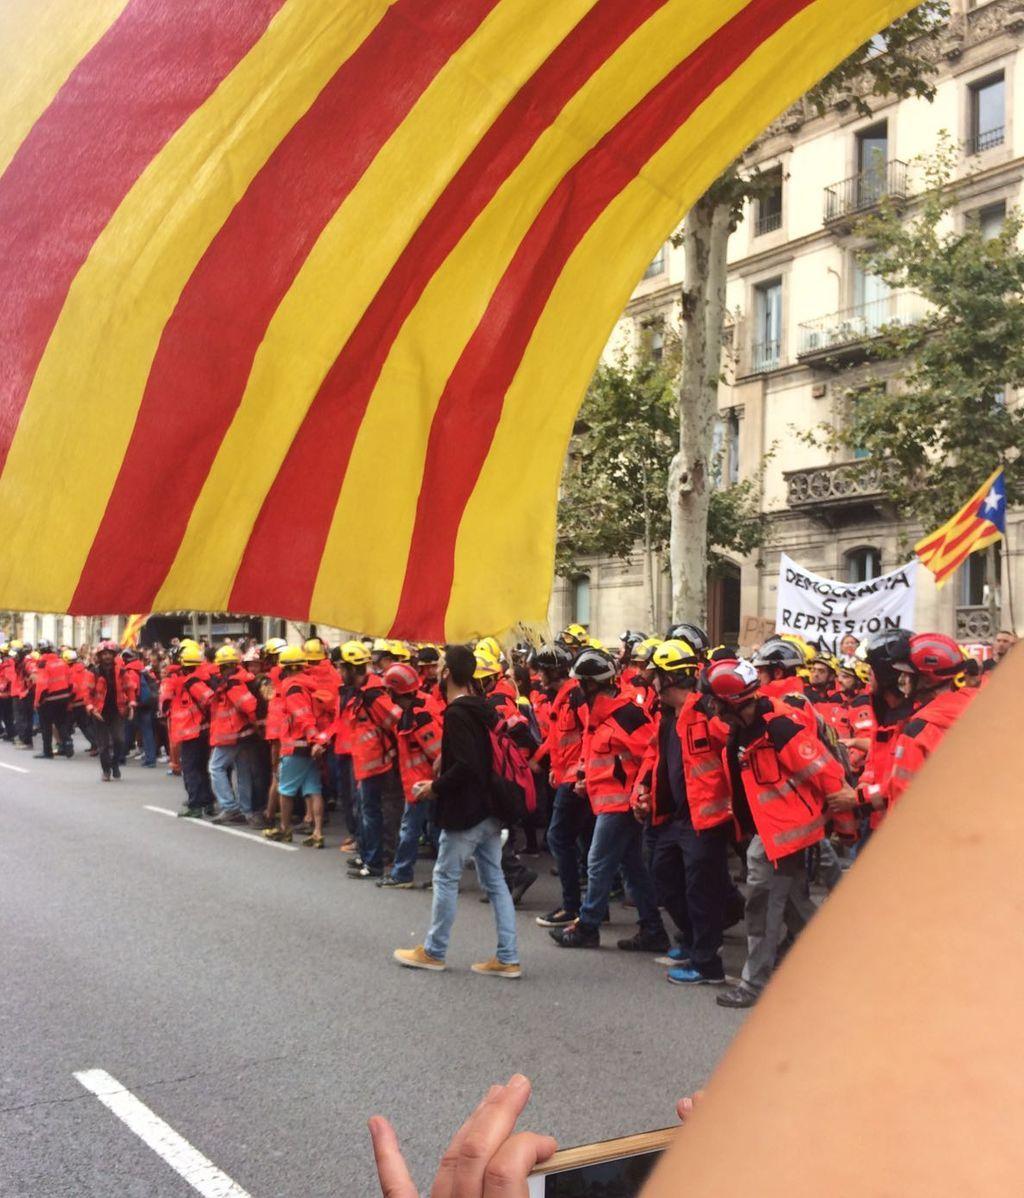 Bomberos se unen a la manifestación